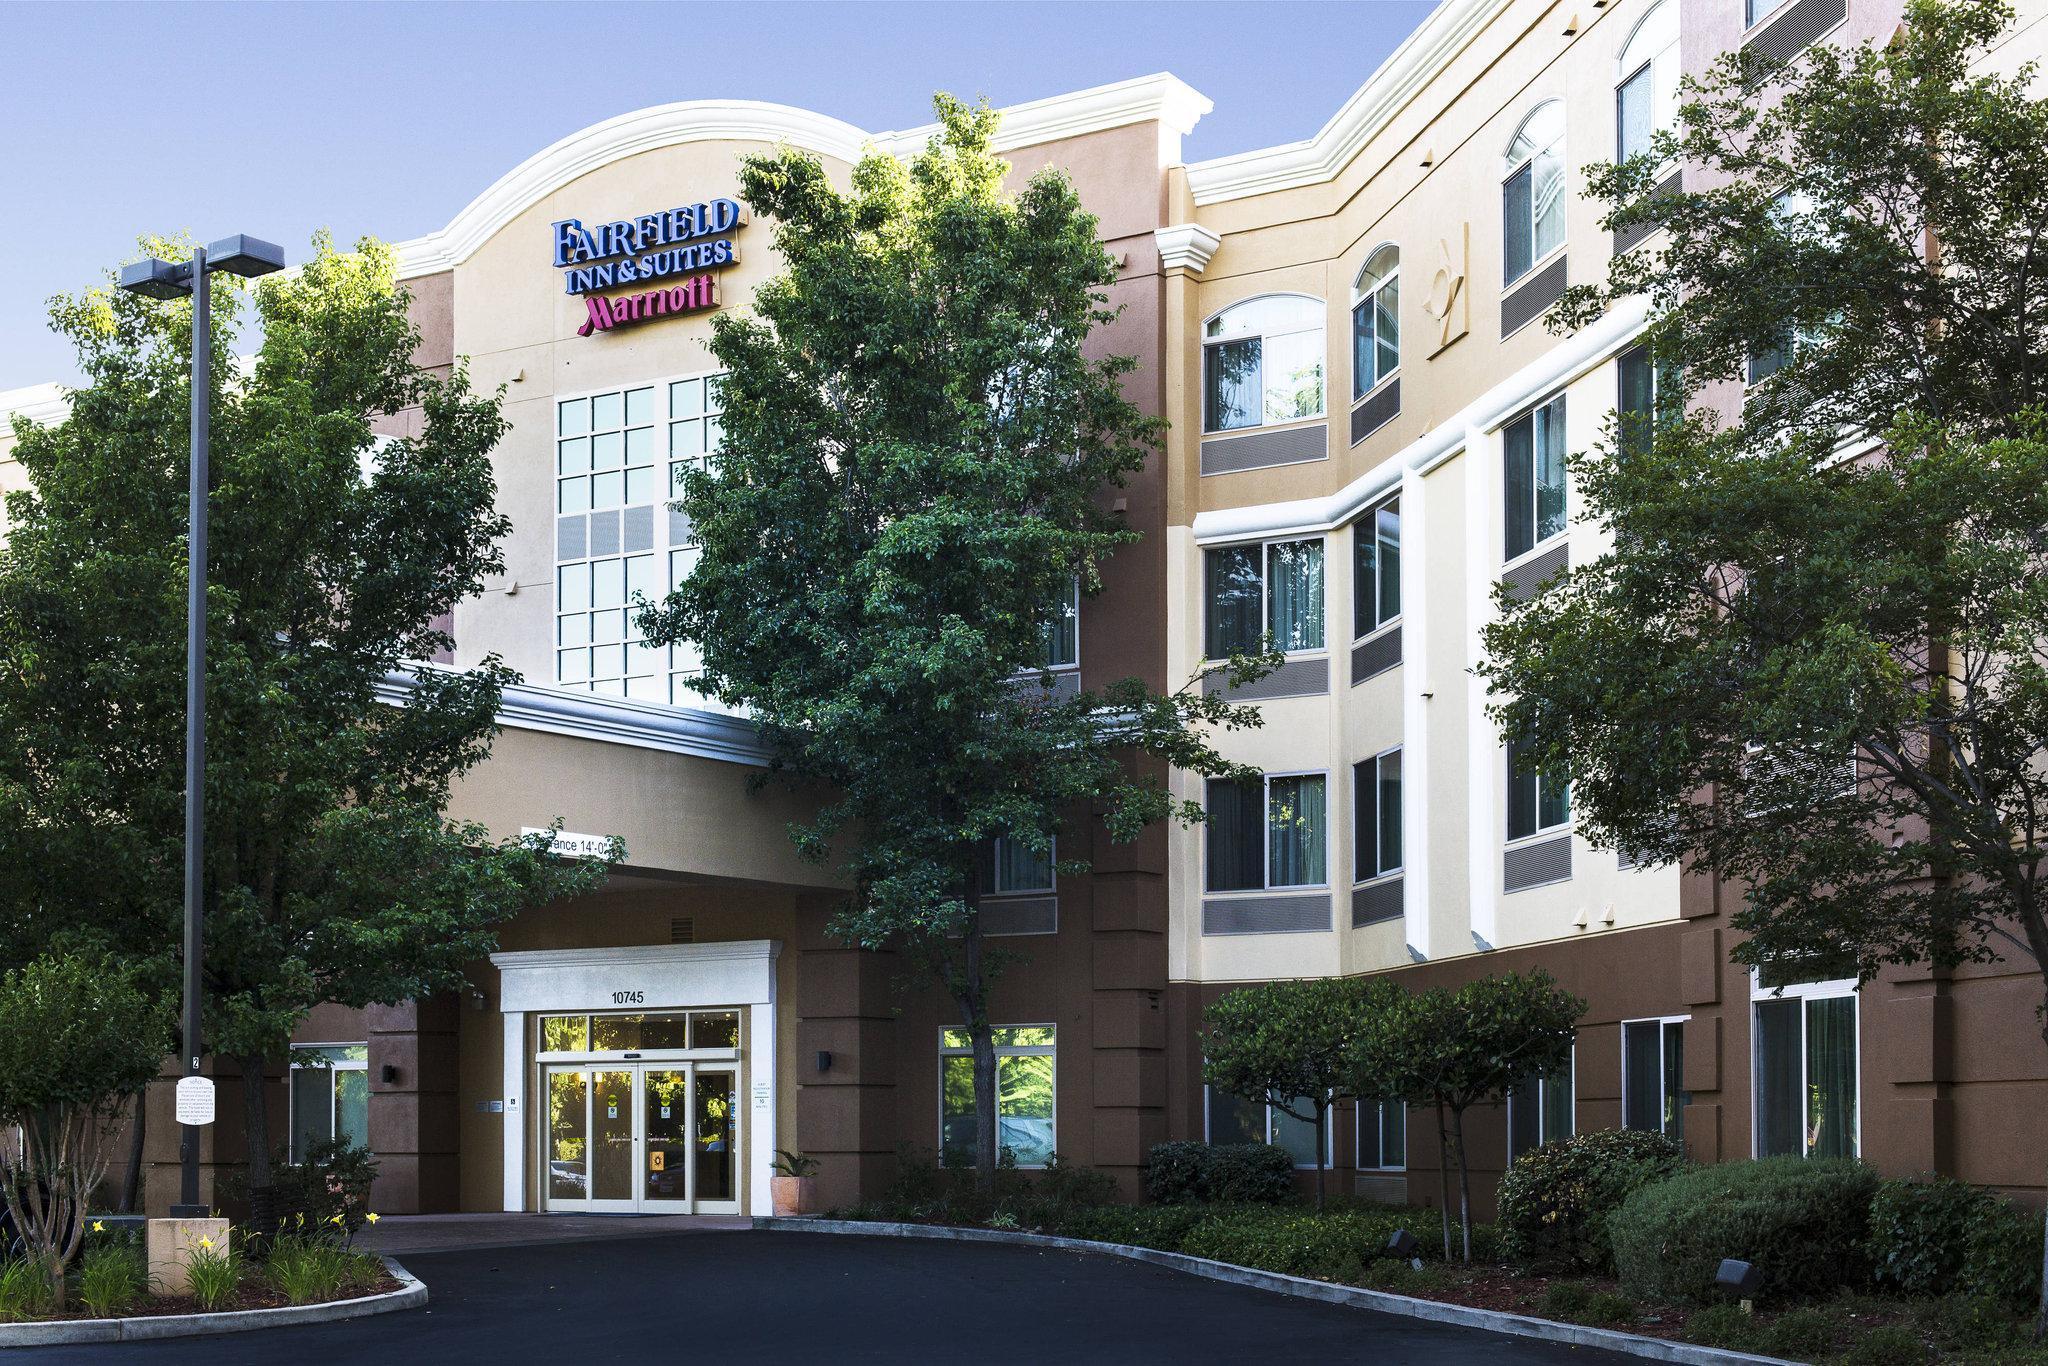 Fairfield Inn And Suites Rancho Cordova